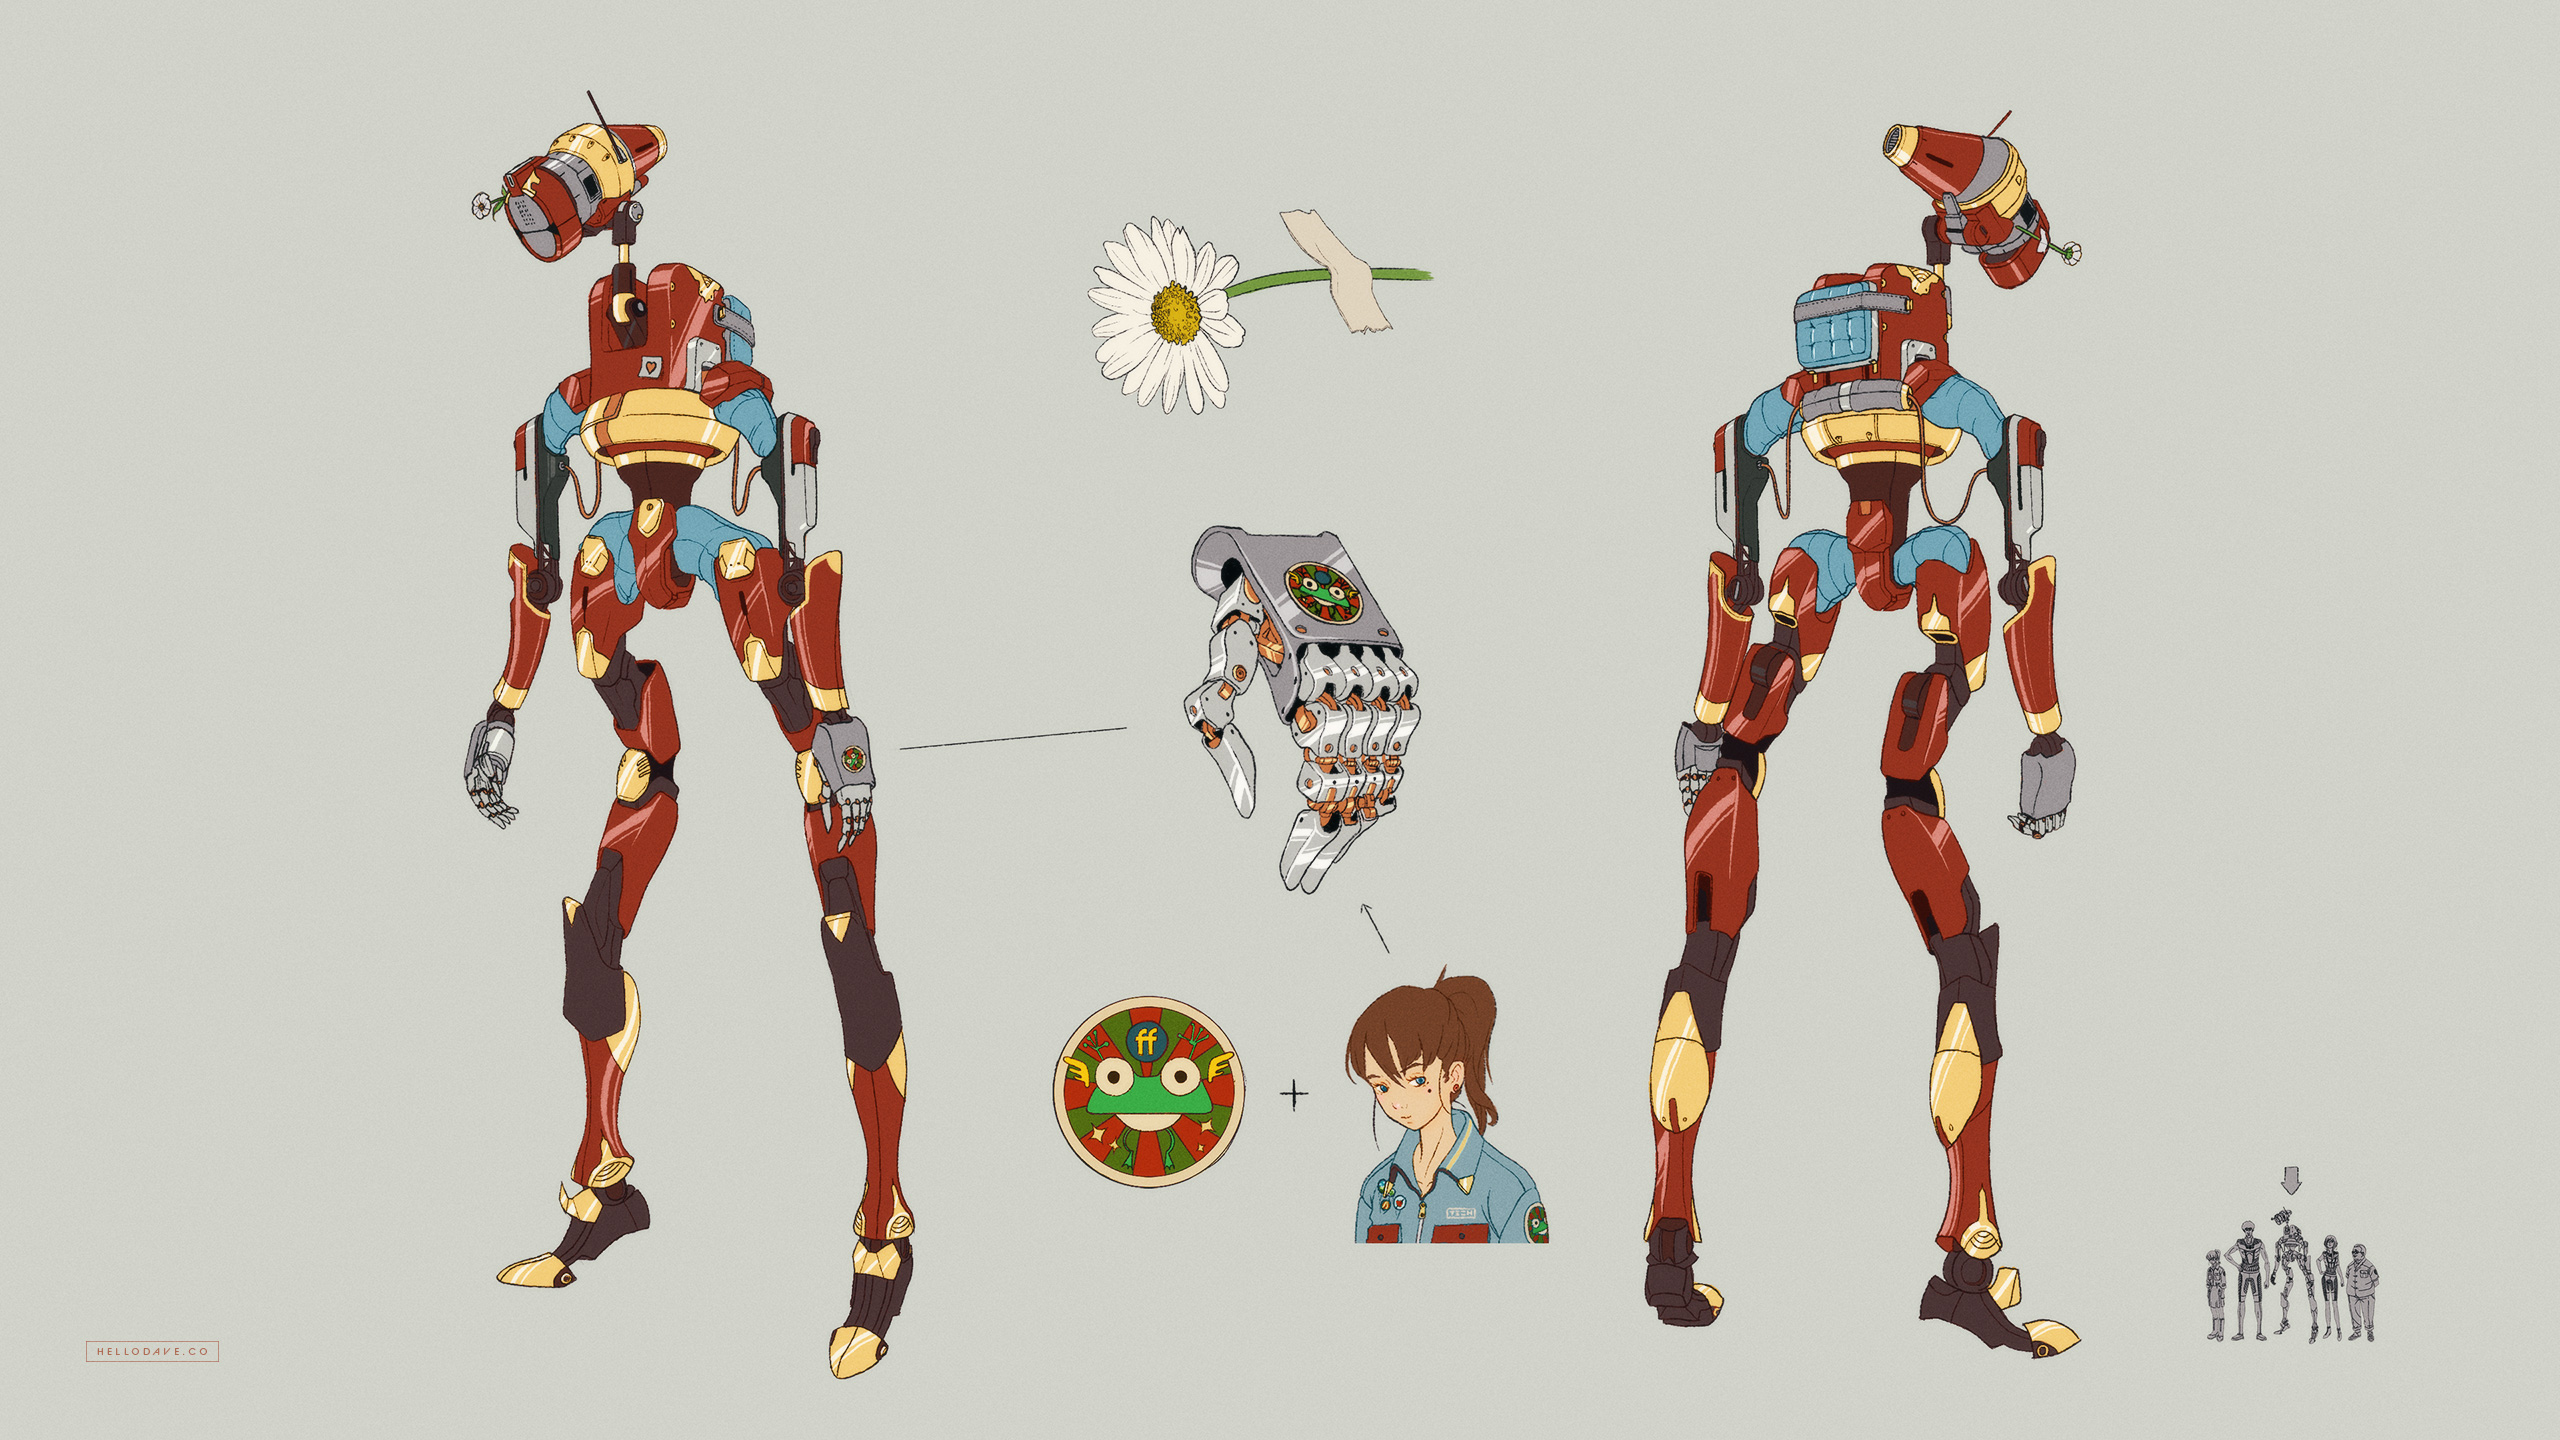 Character_sheet_ServiceBot_01_3K